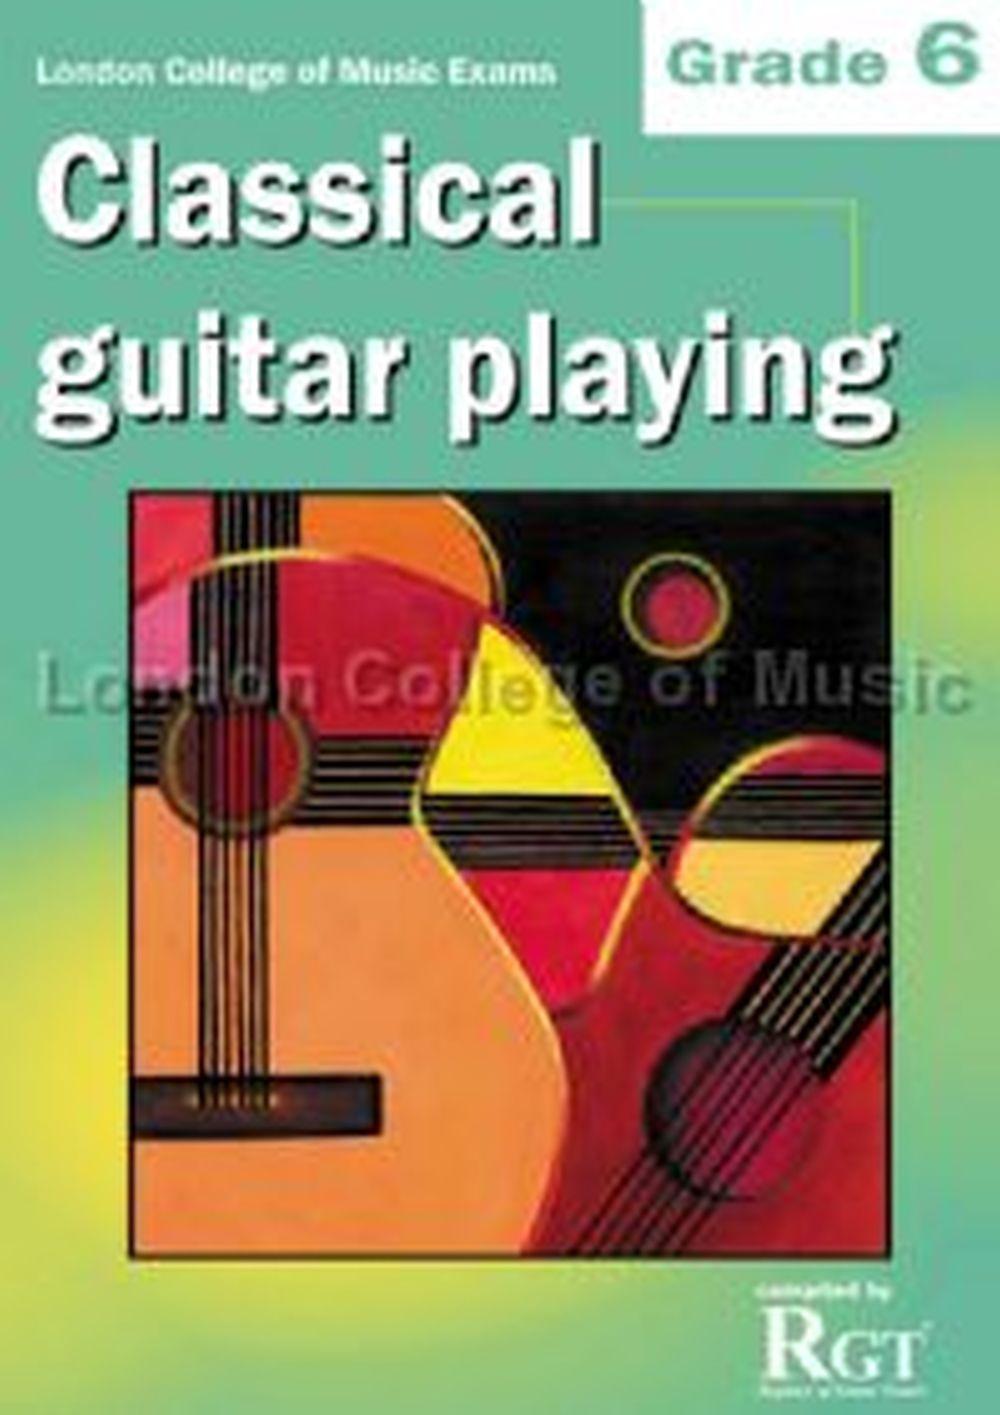 LCM Classical Guitar Playing Grade 6 (2008-2018): Guitar: Instrumental Tutor